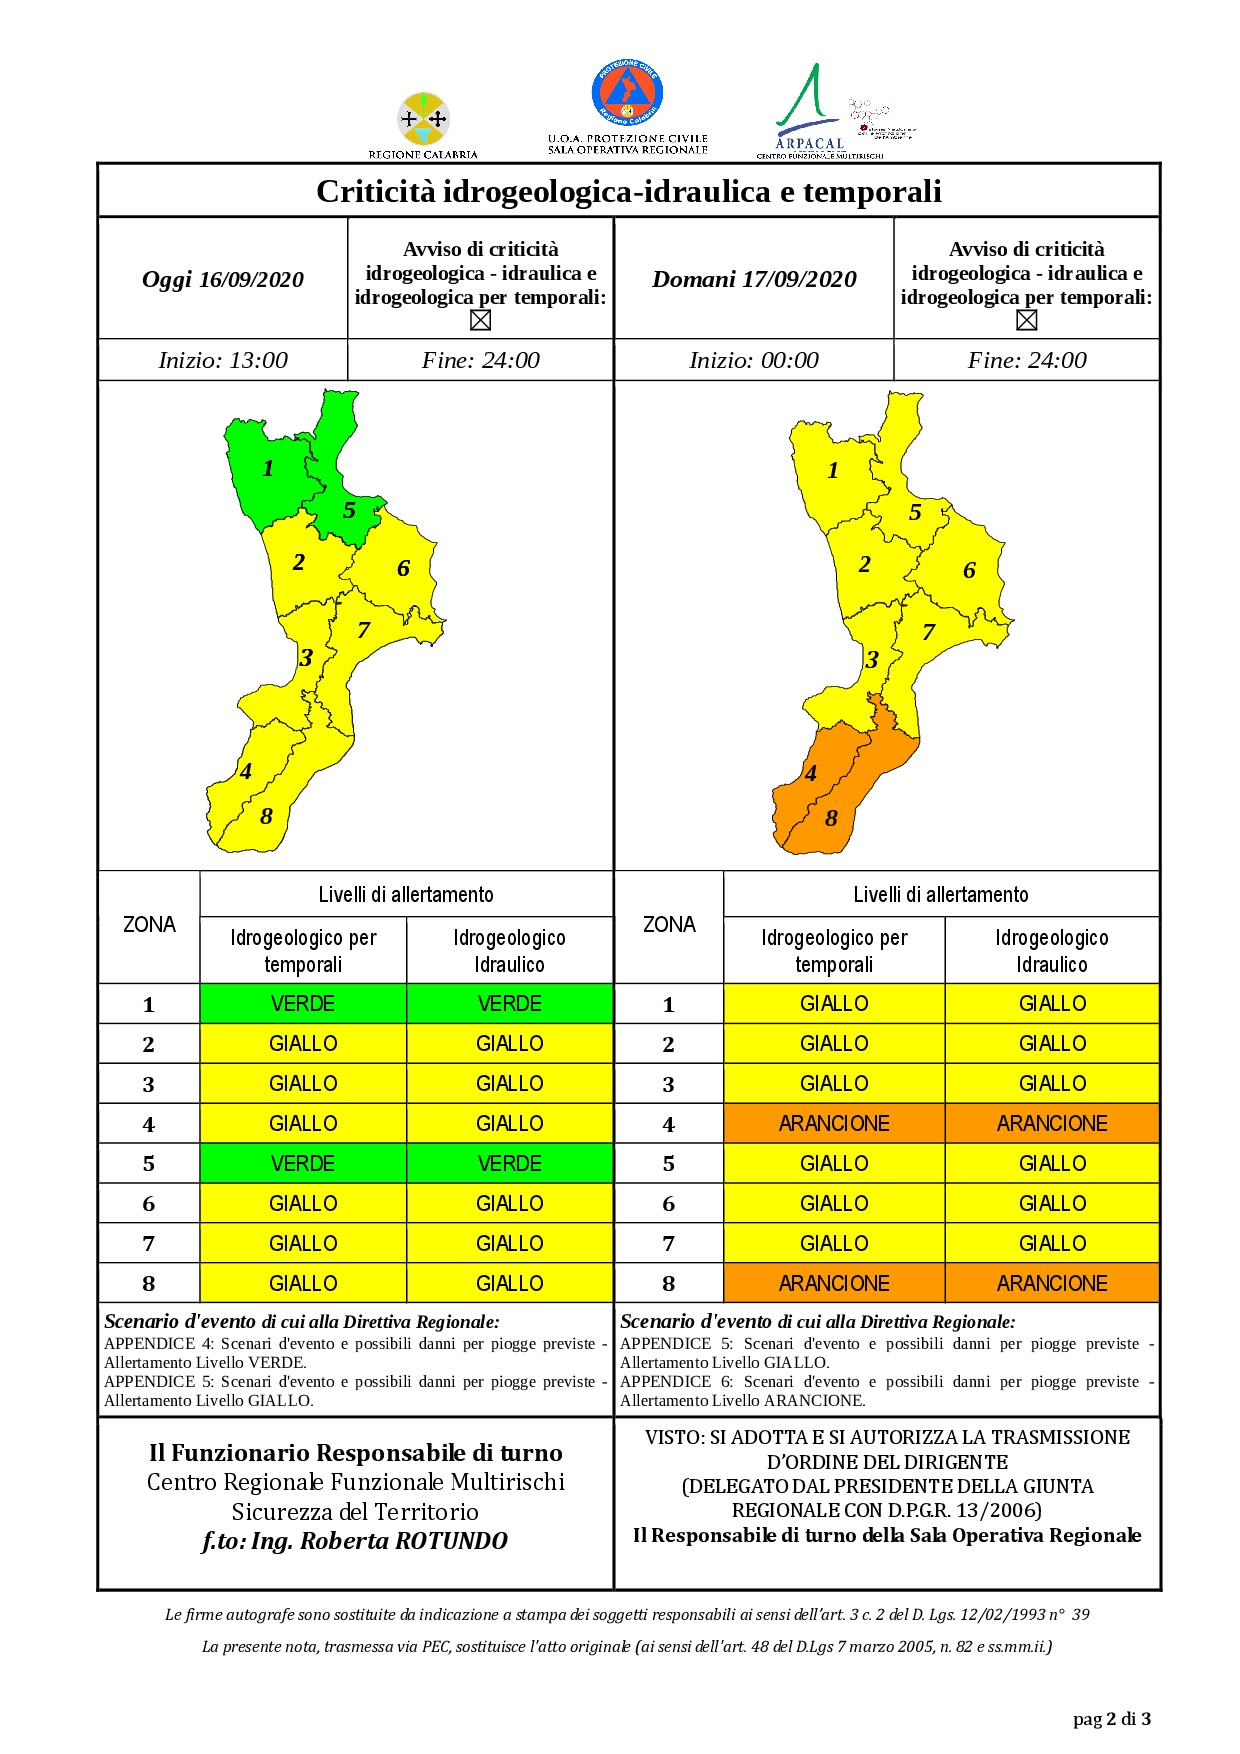 Criticità idrogeologica-idraulica e temporali in Calabria 16-09-2020